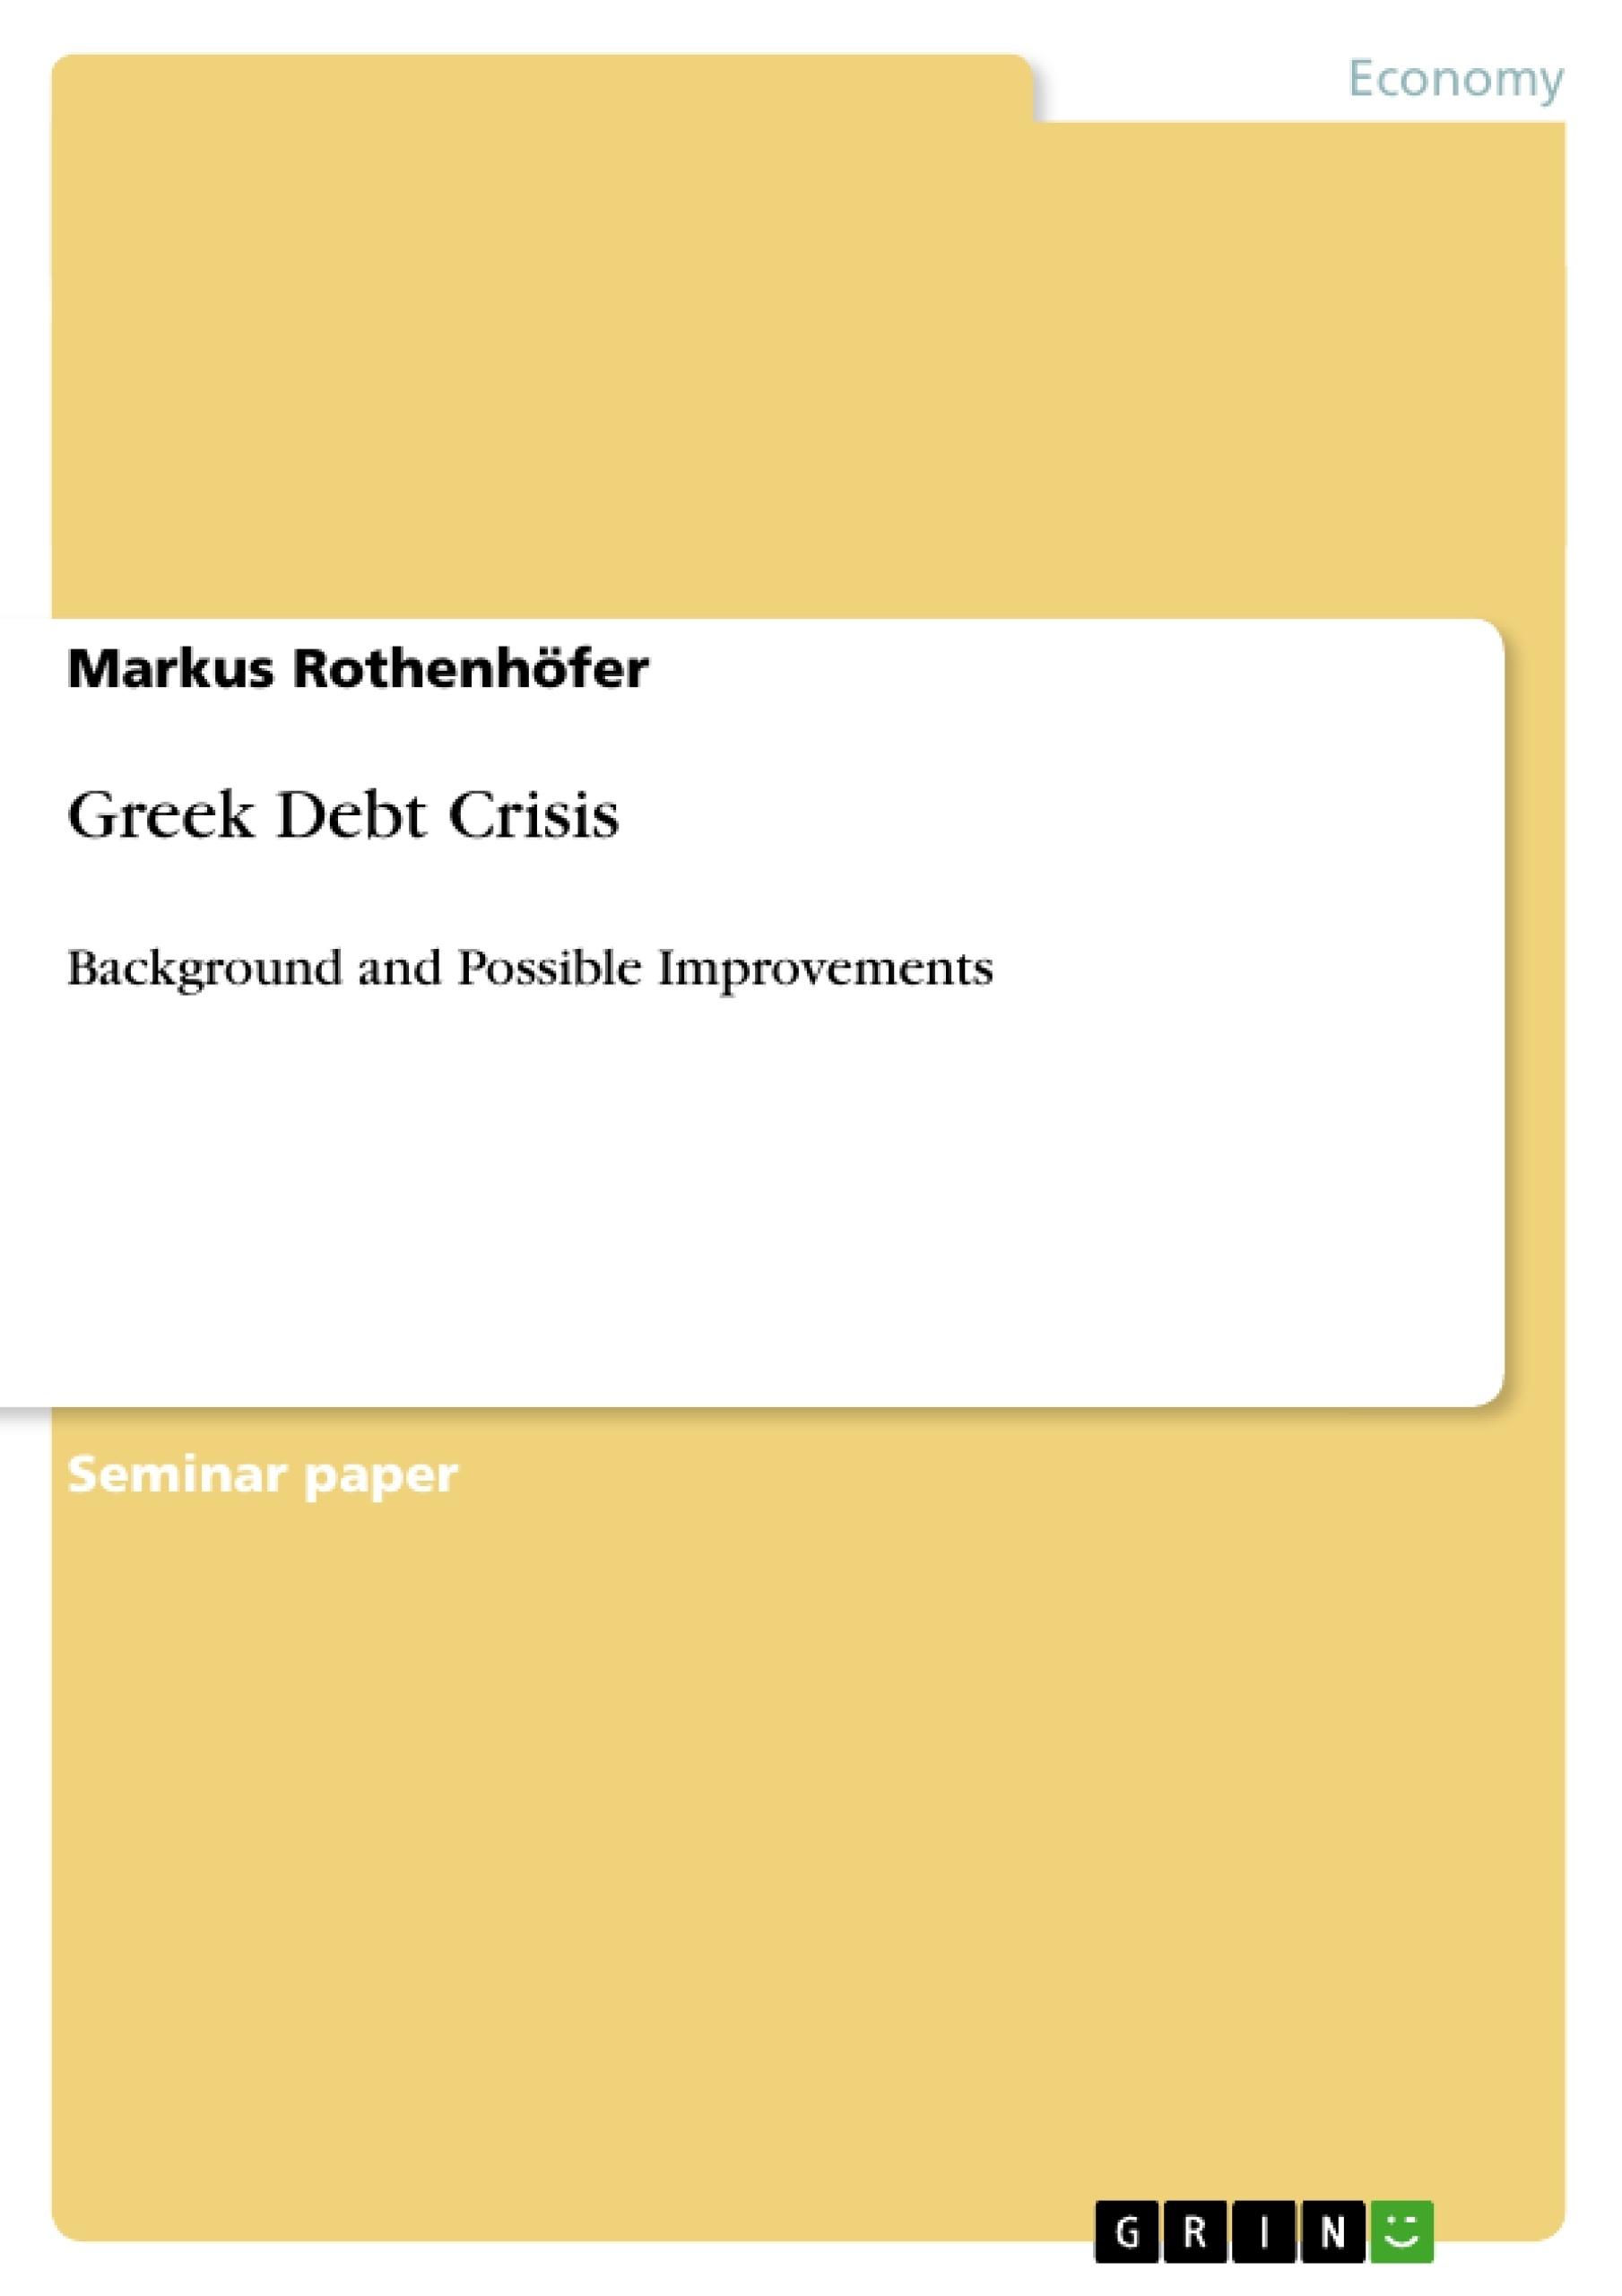 Title: Greek Debt Crisis